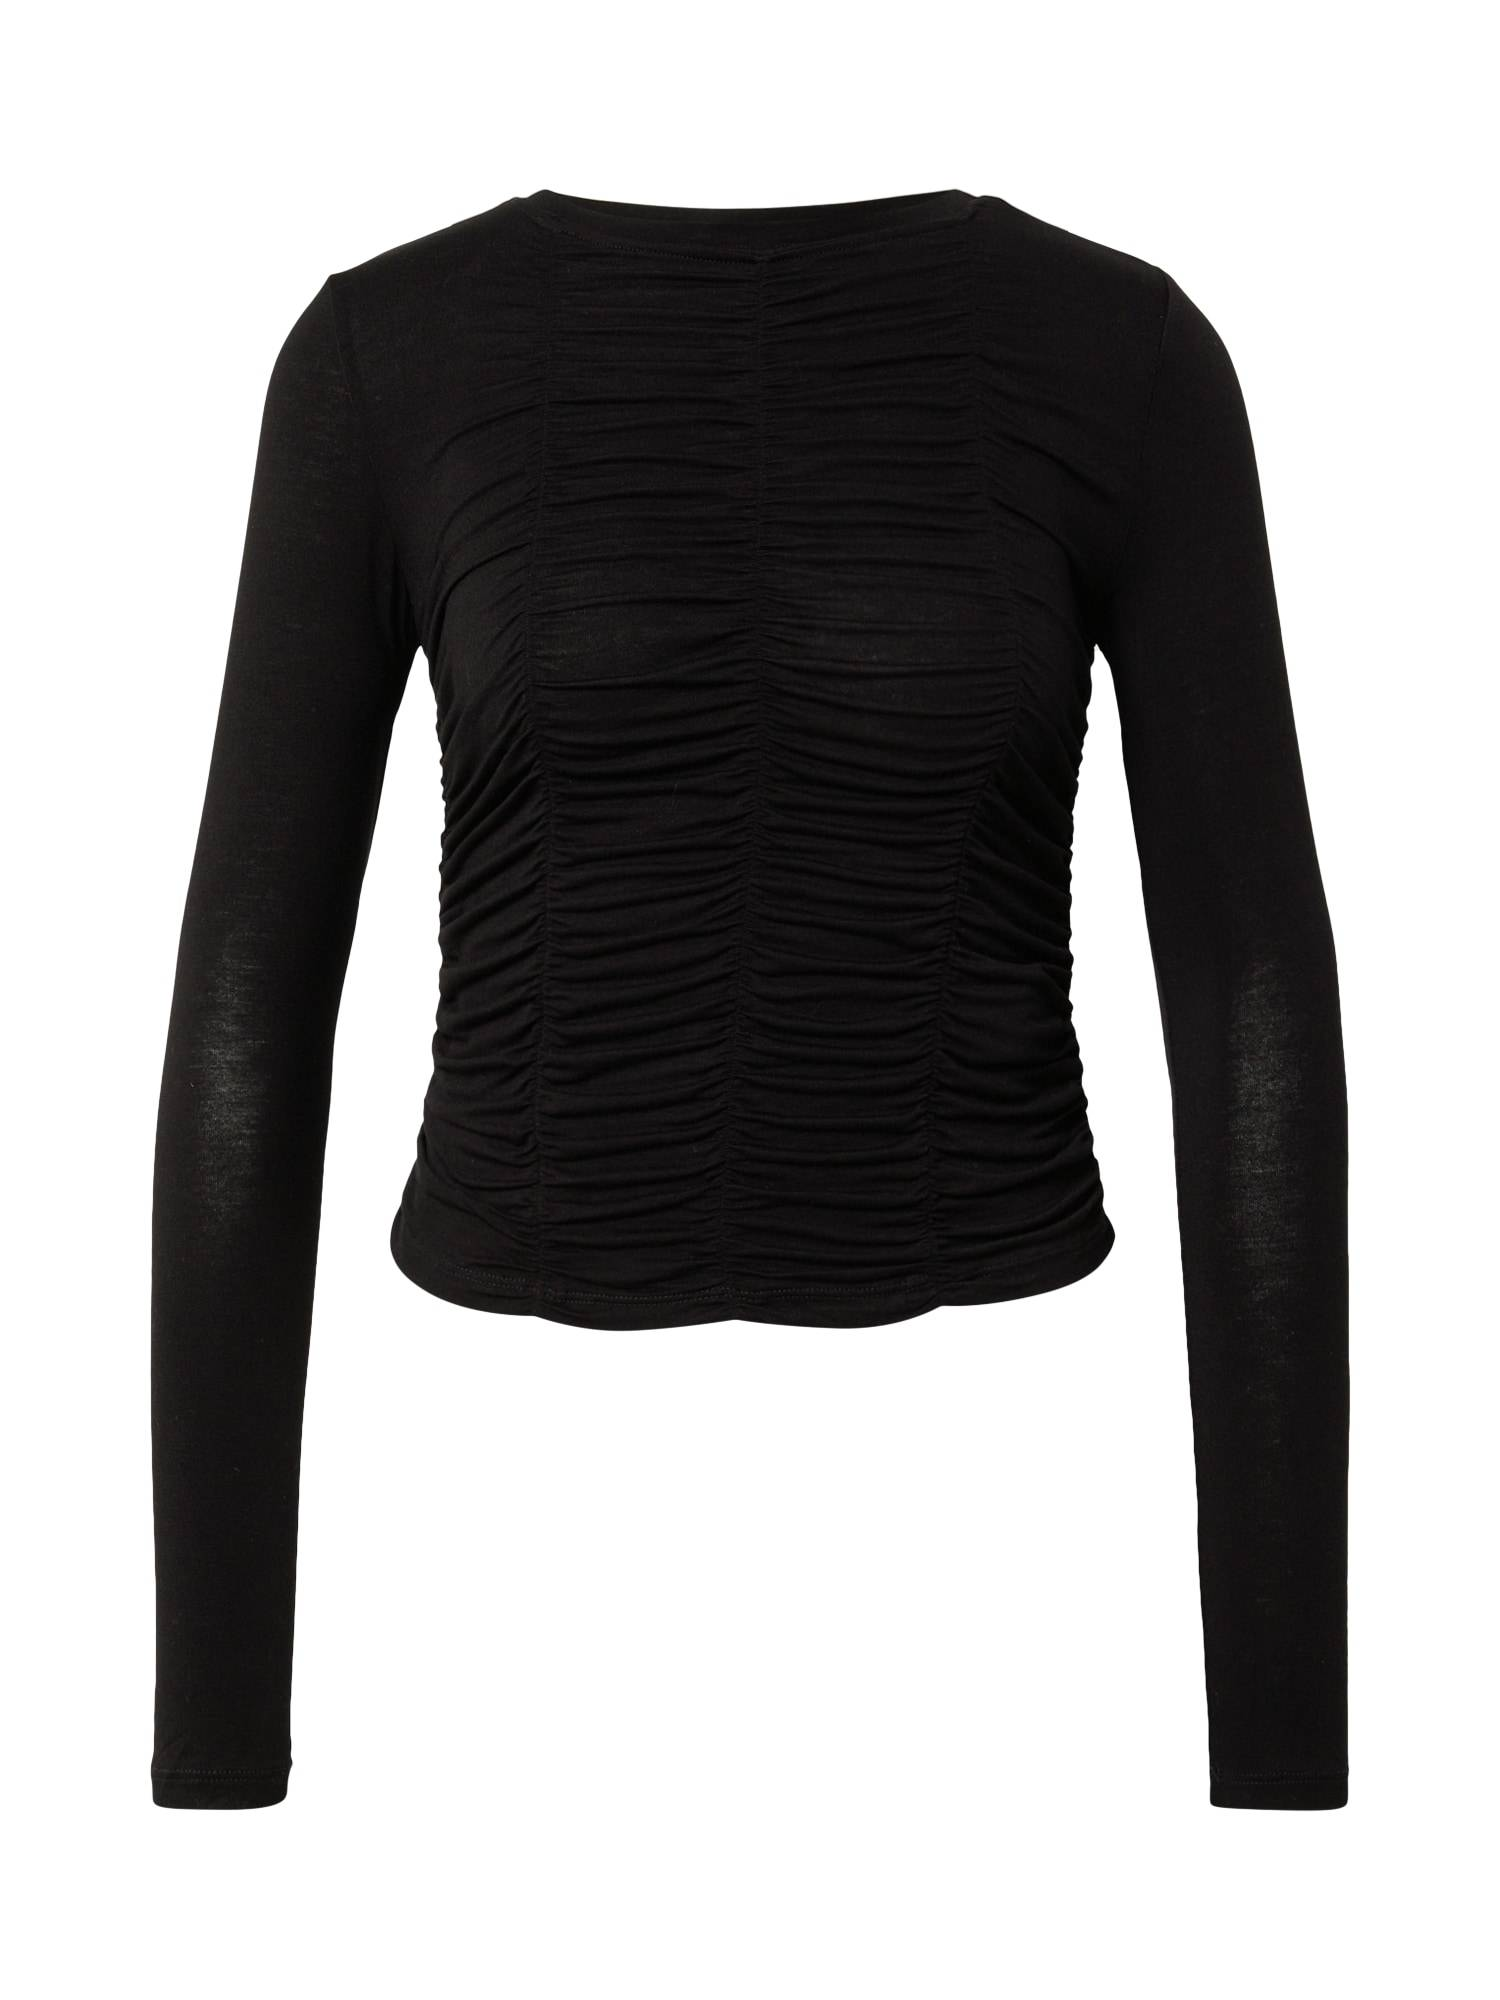 Gina Tricot Haut 'Catti'  - Noir - Taille: S - female